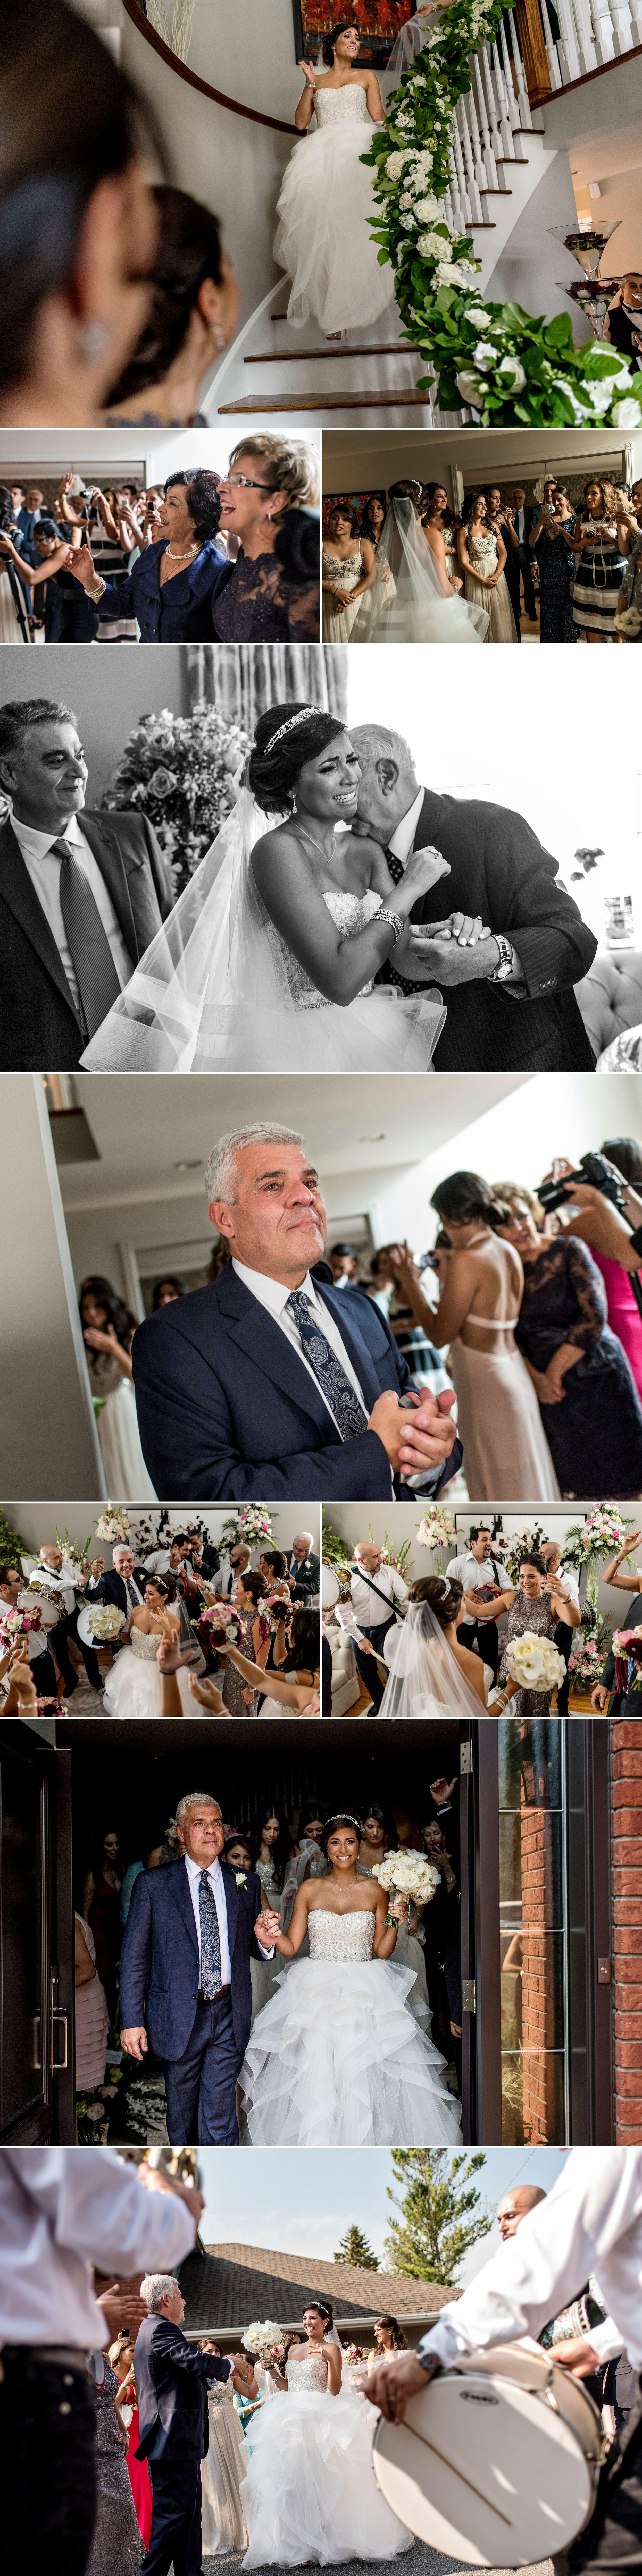 Bride reveal in Ottawa